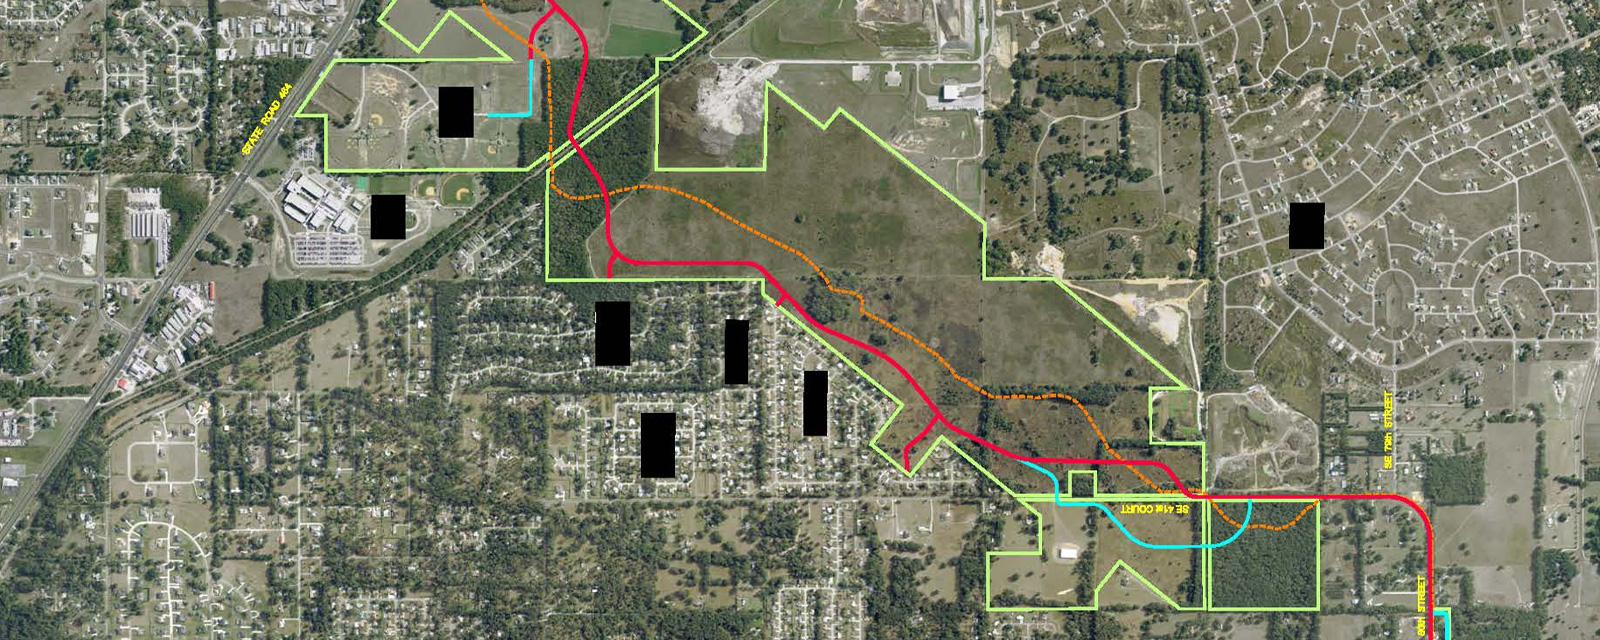 Santos Trail Corridor Study | DRMP, Inc.